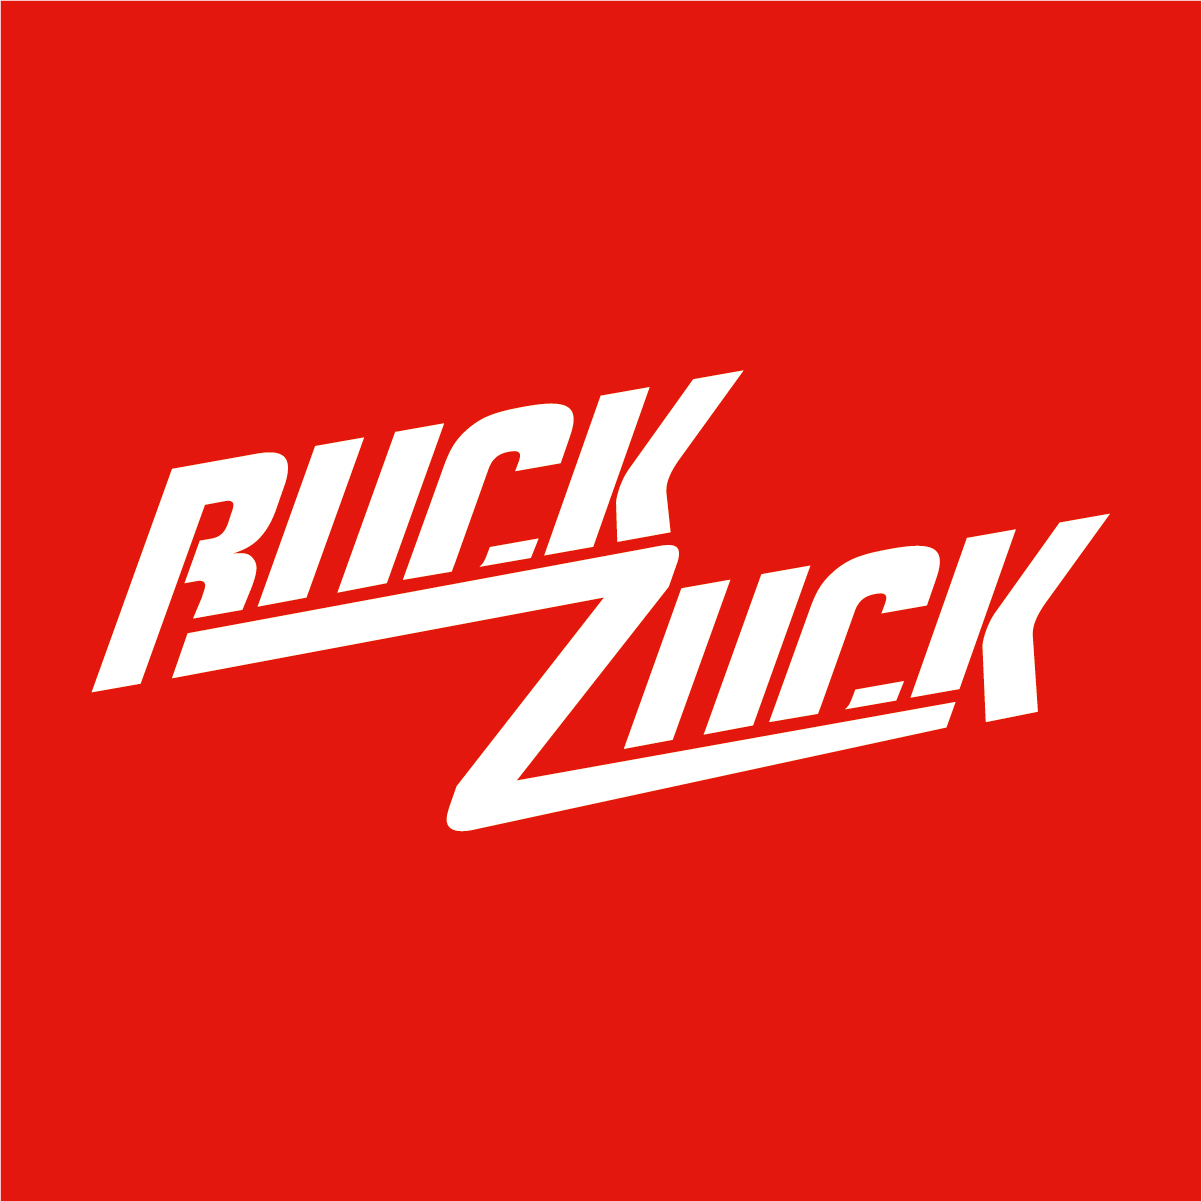 Komplettset Sono Pro Forest Designboden 4,5mm Vanity White